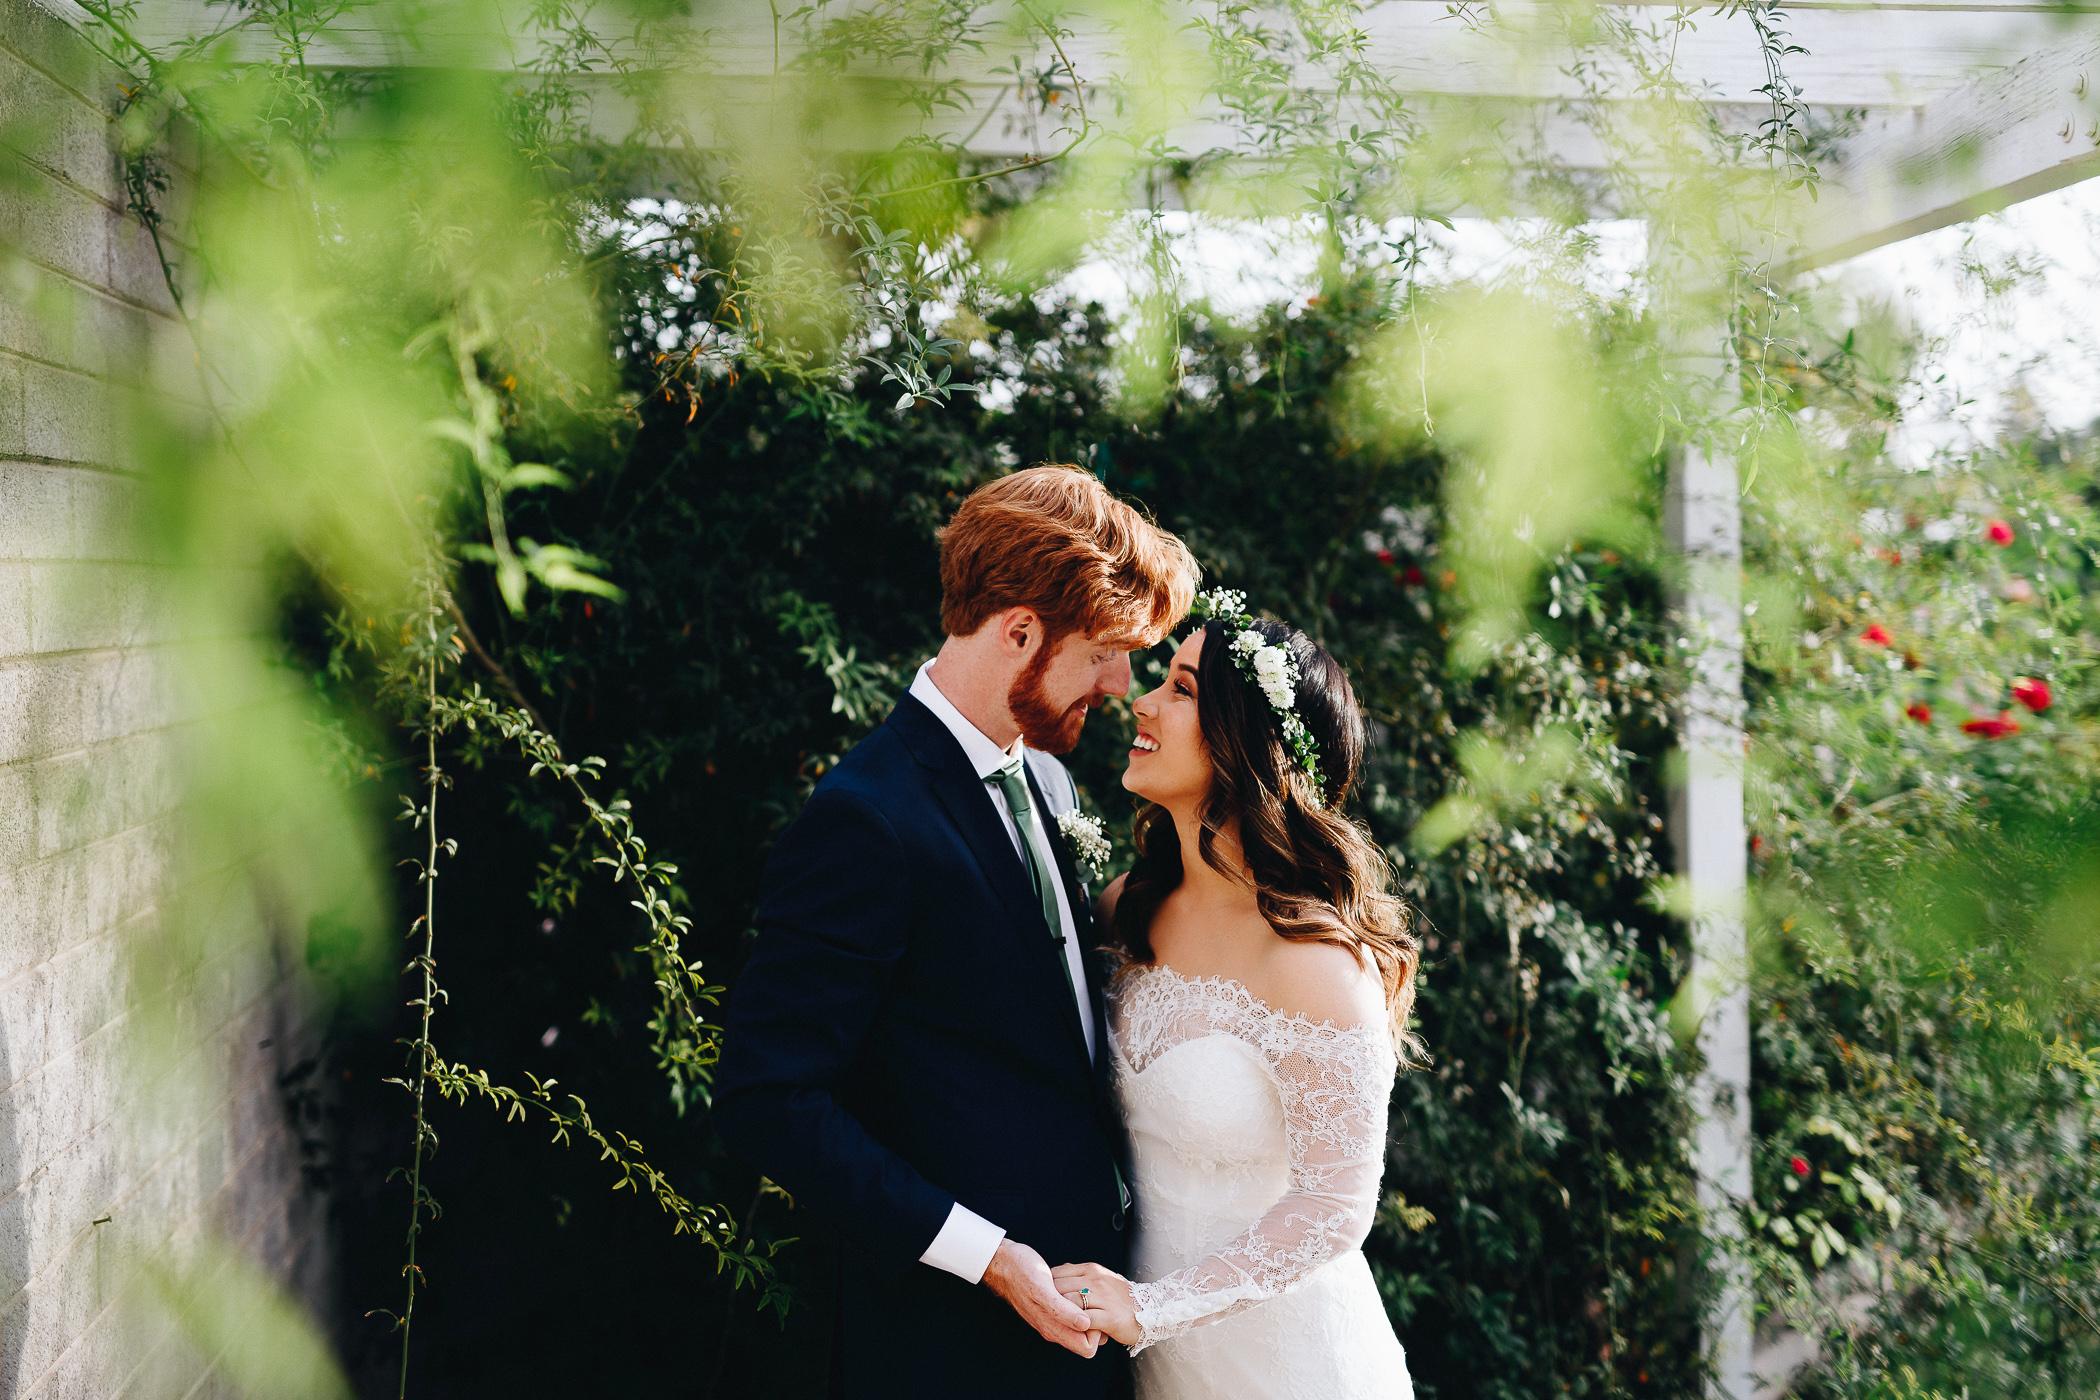 181104-Luxium-Weddings-Arizona-@matt__Le-Brandon-Kariana-Phoenix-Valley-Garden-Center-1113.jpg